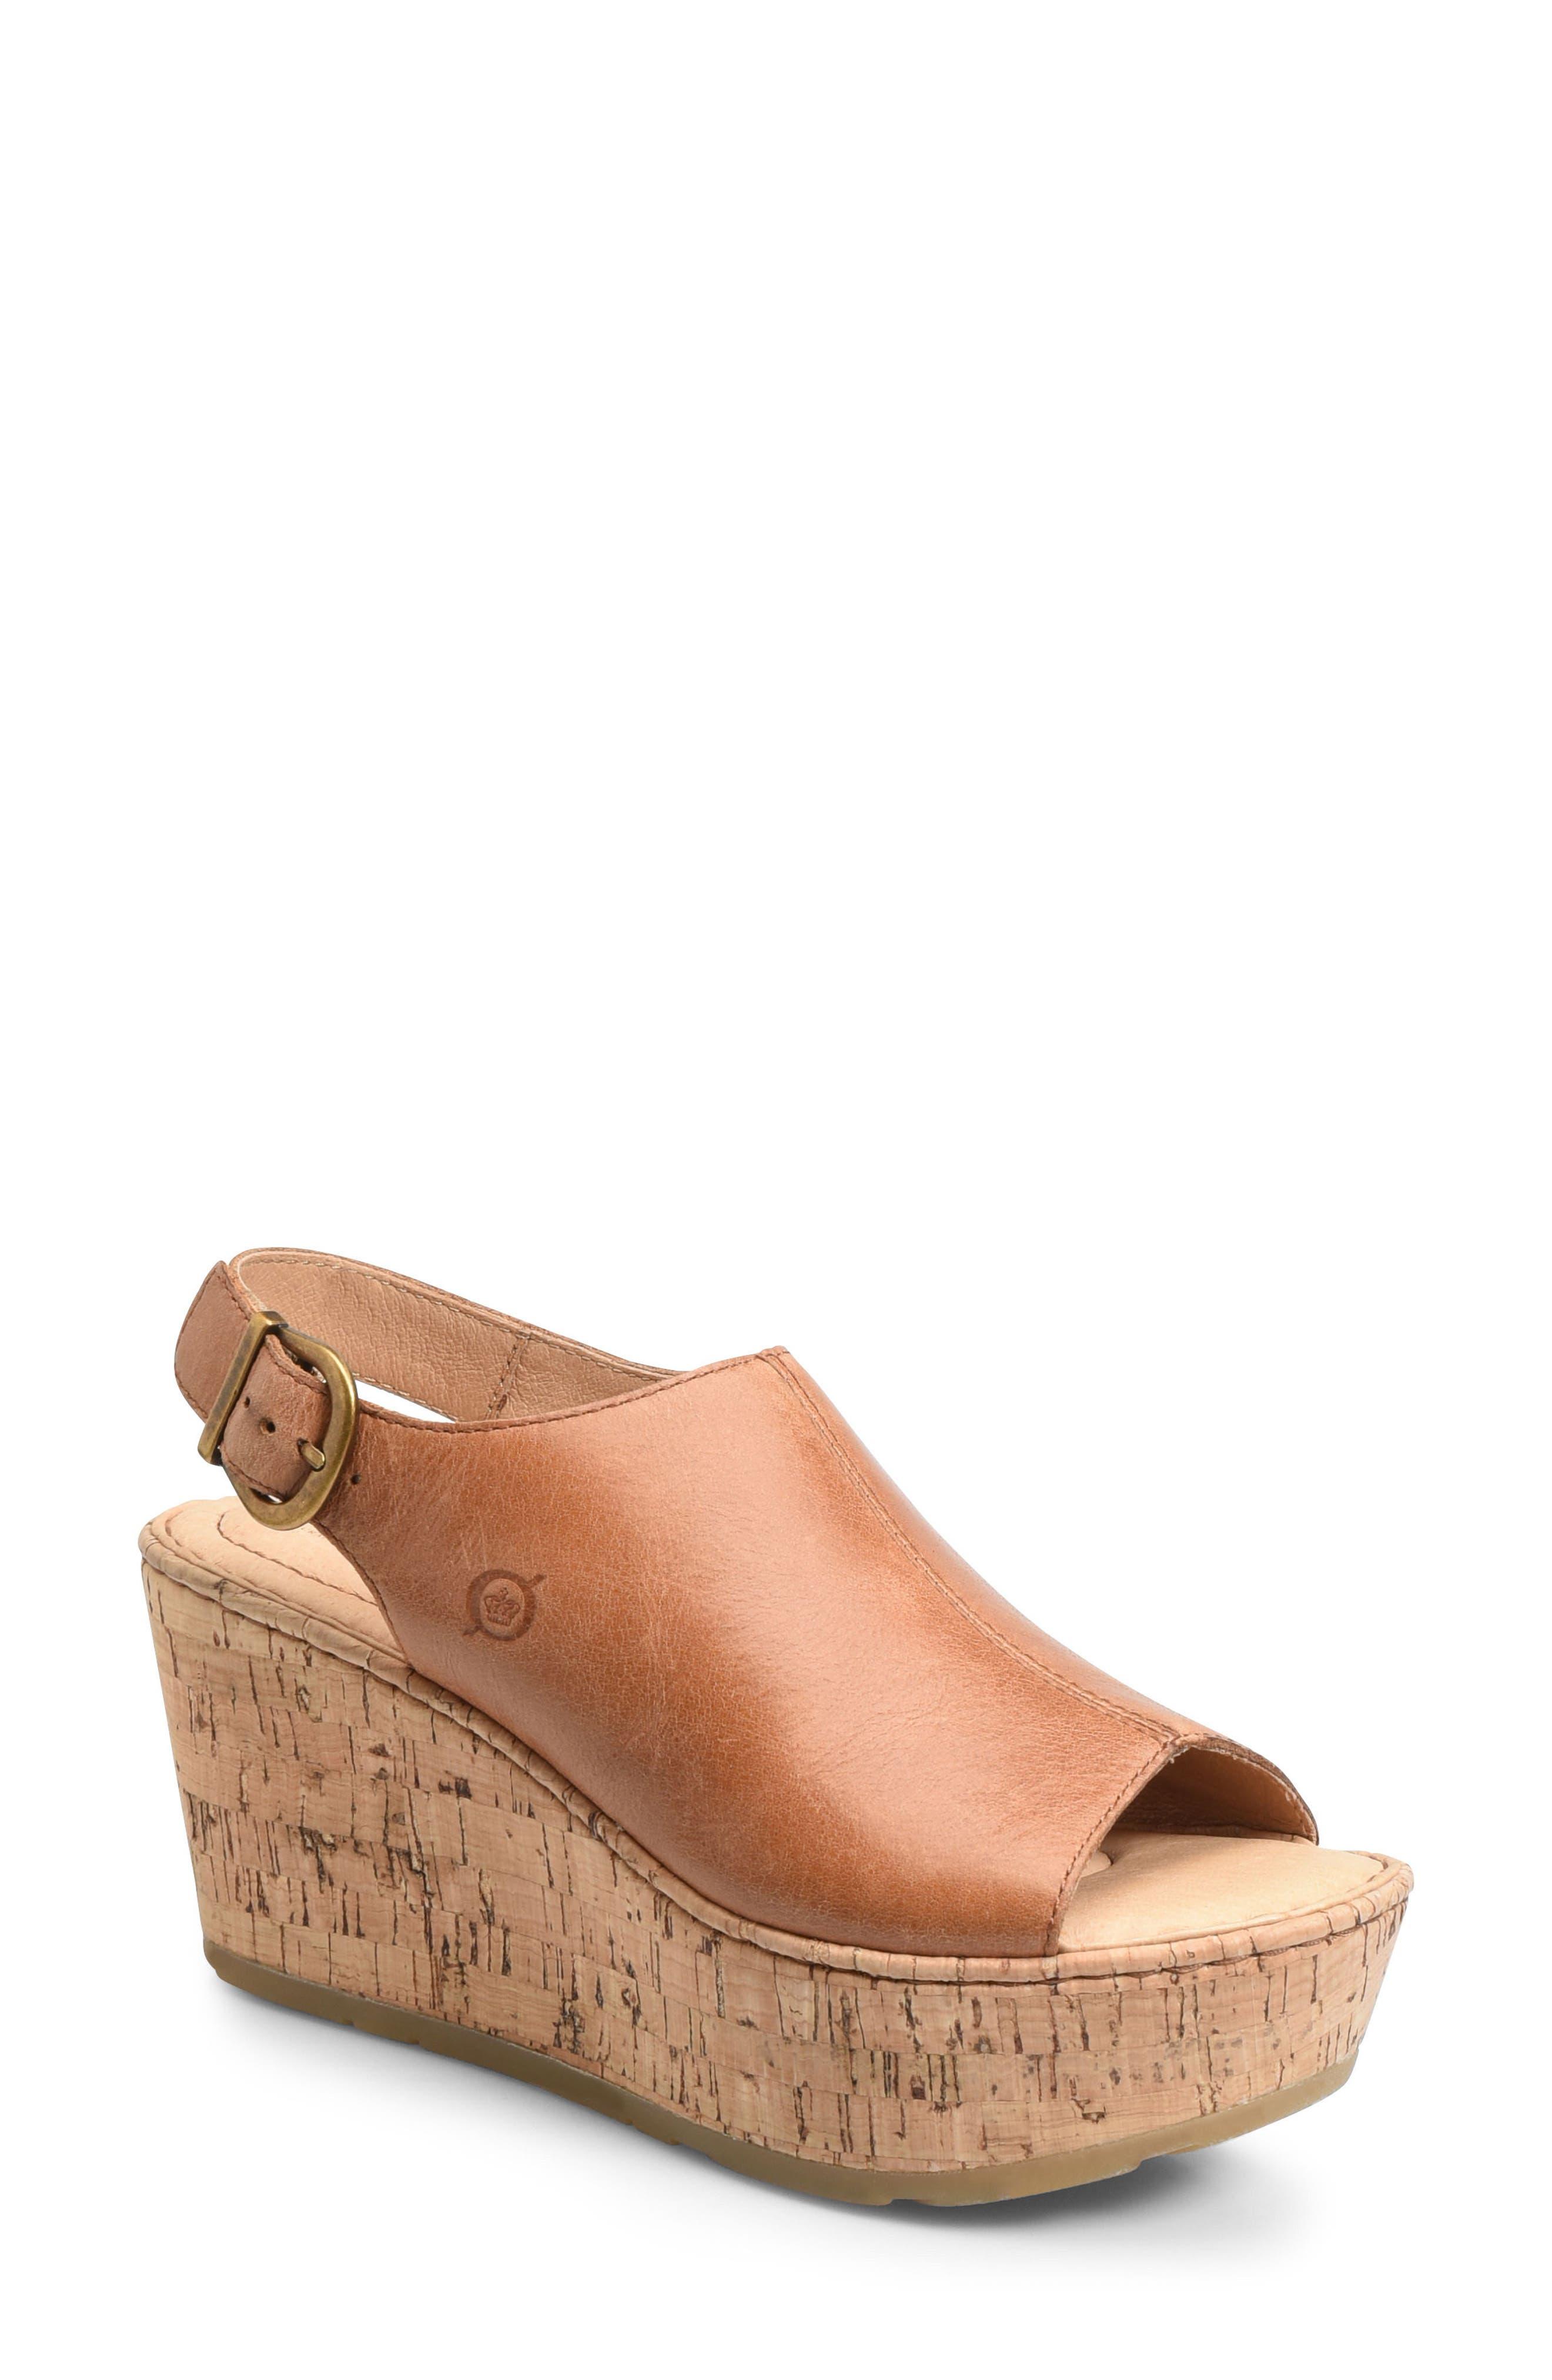 Orbit Platform Wedge Sandal,                         Main,                         color, Brown Leather